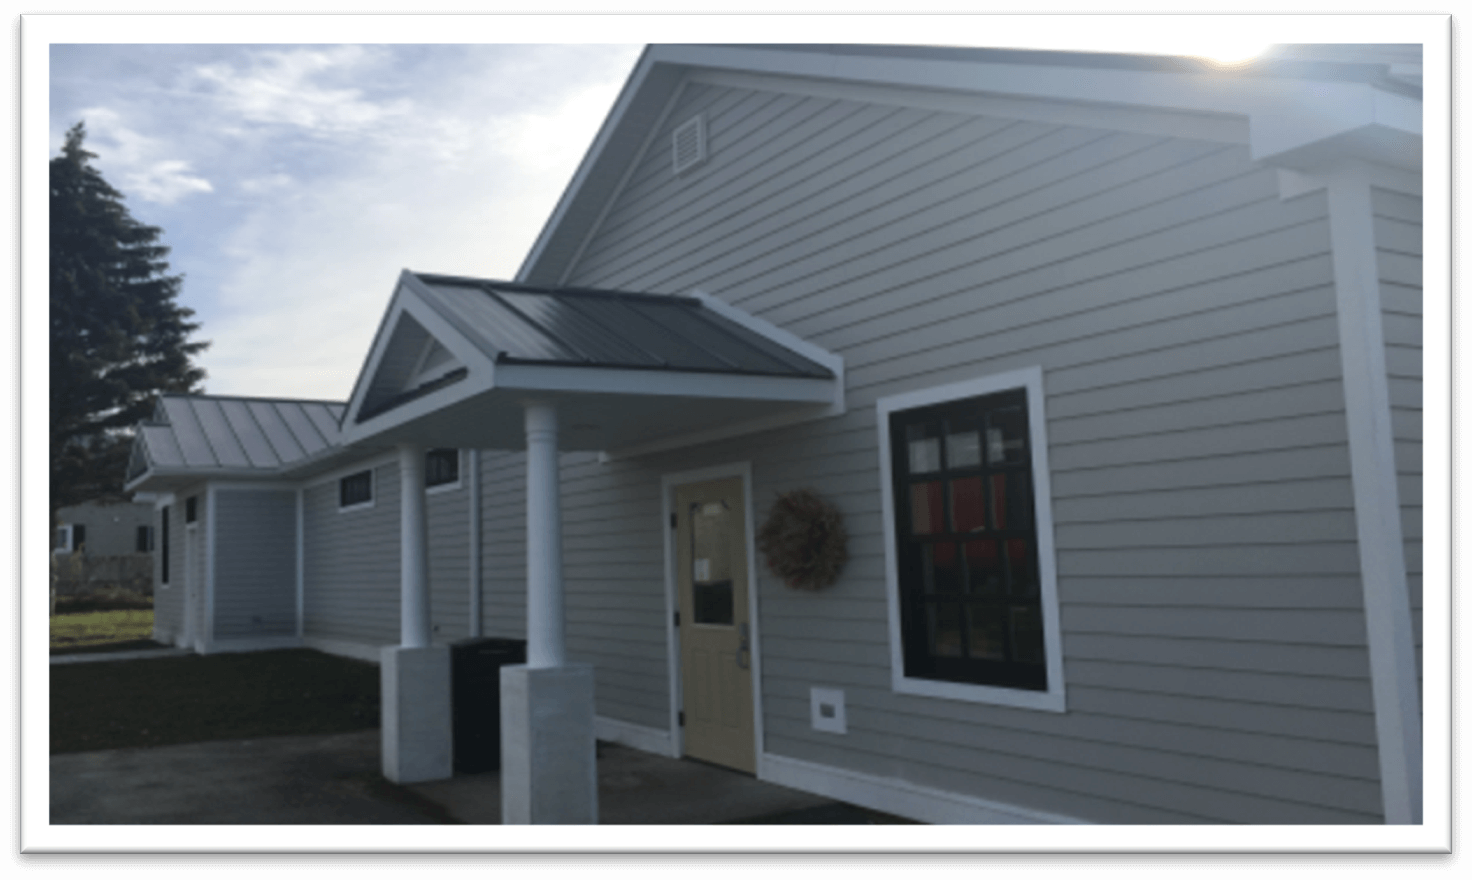 jadestone-engineering-Village of Morristown